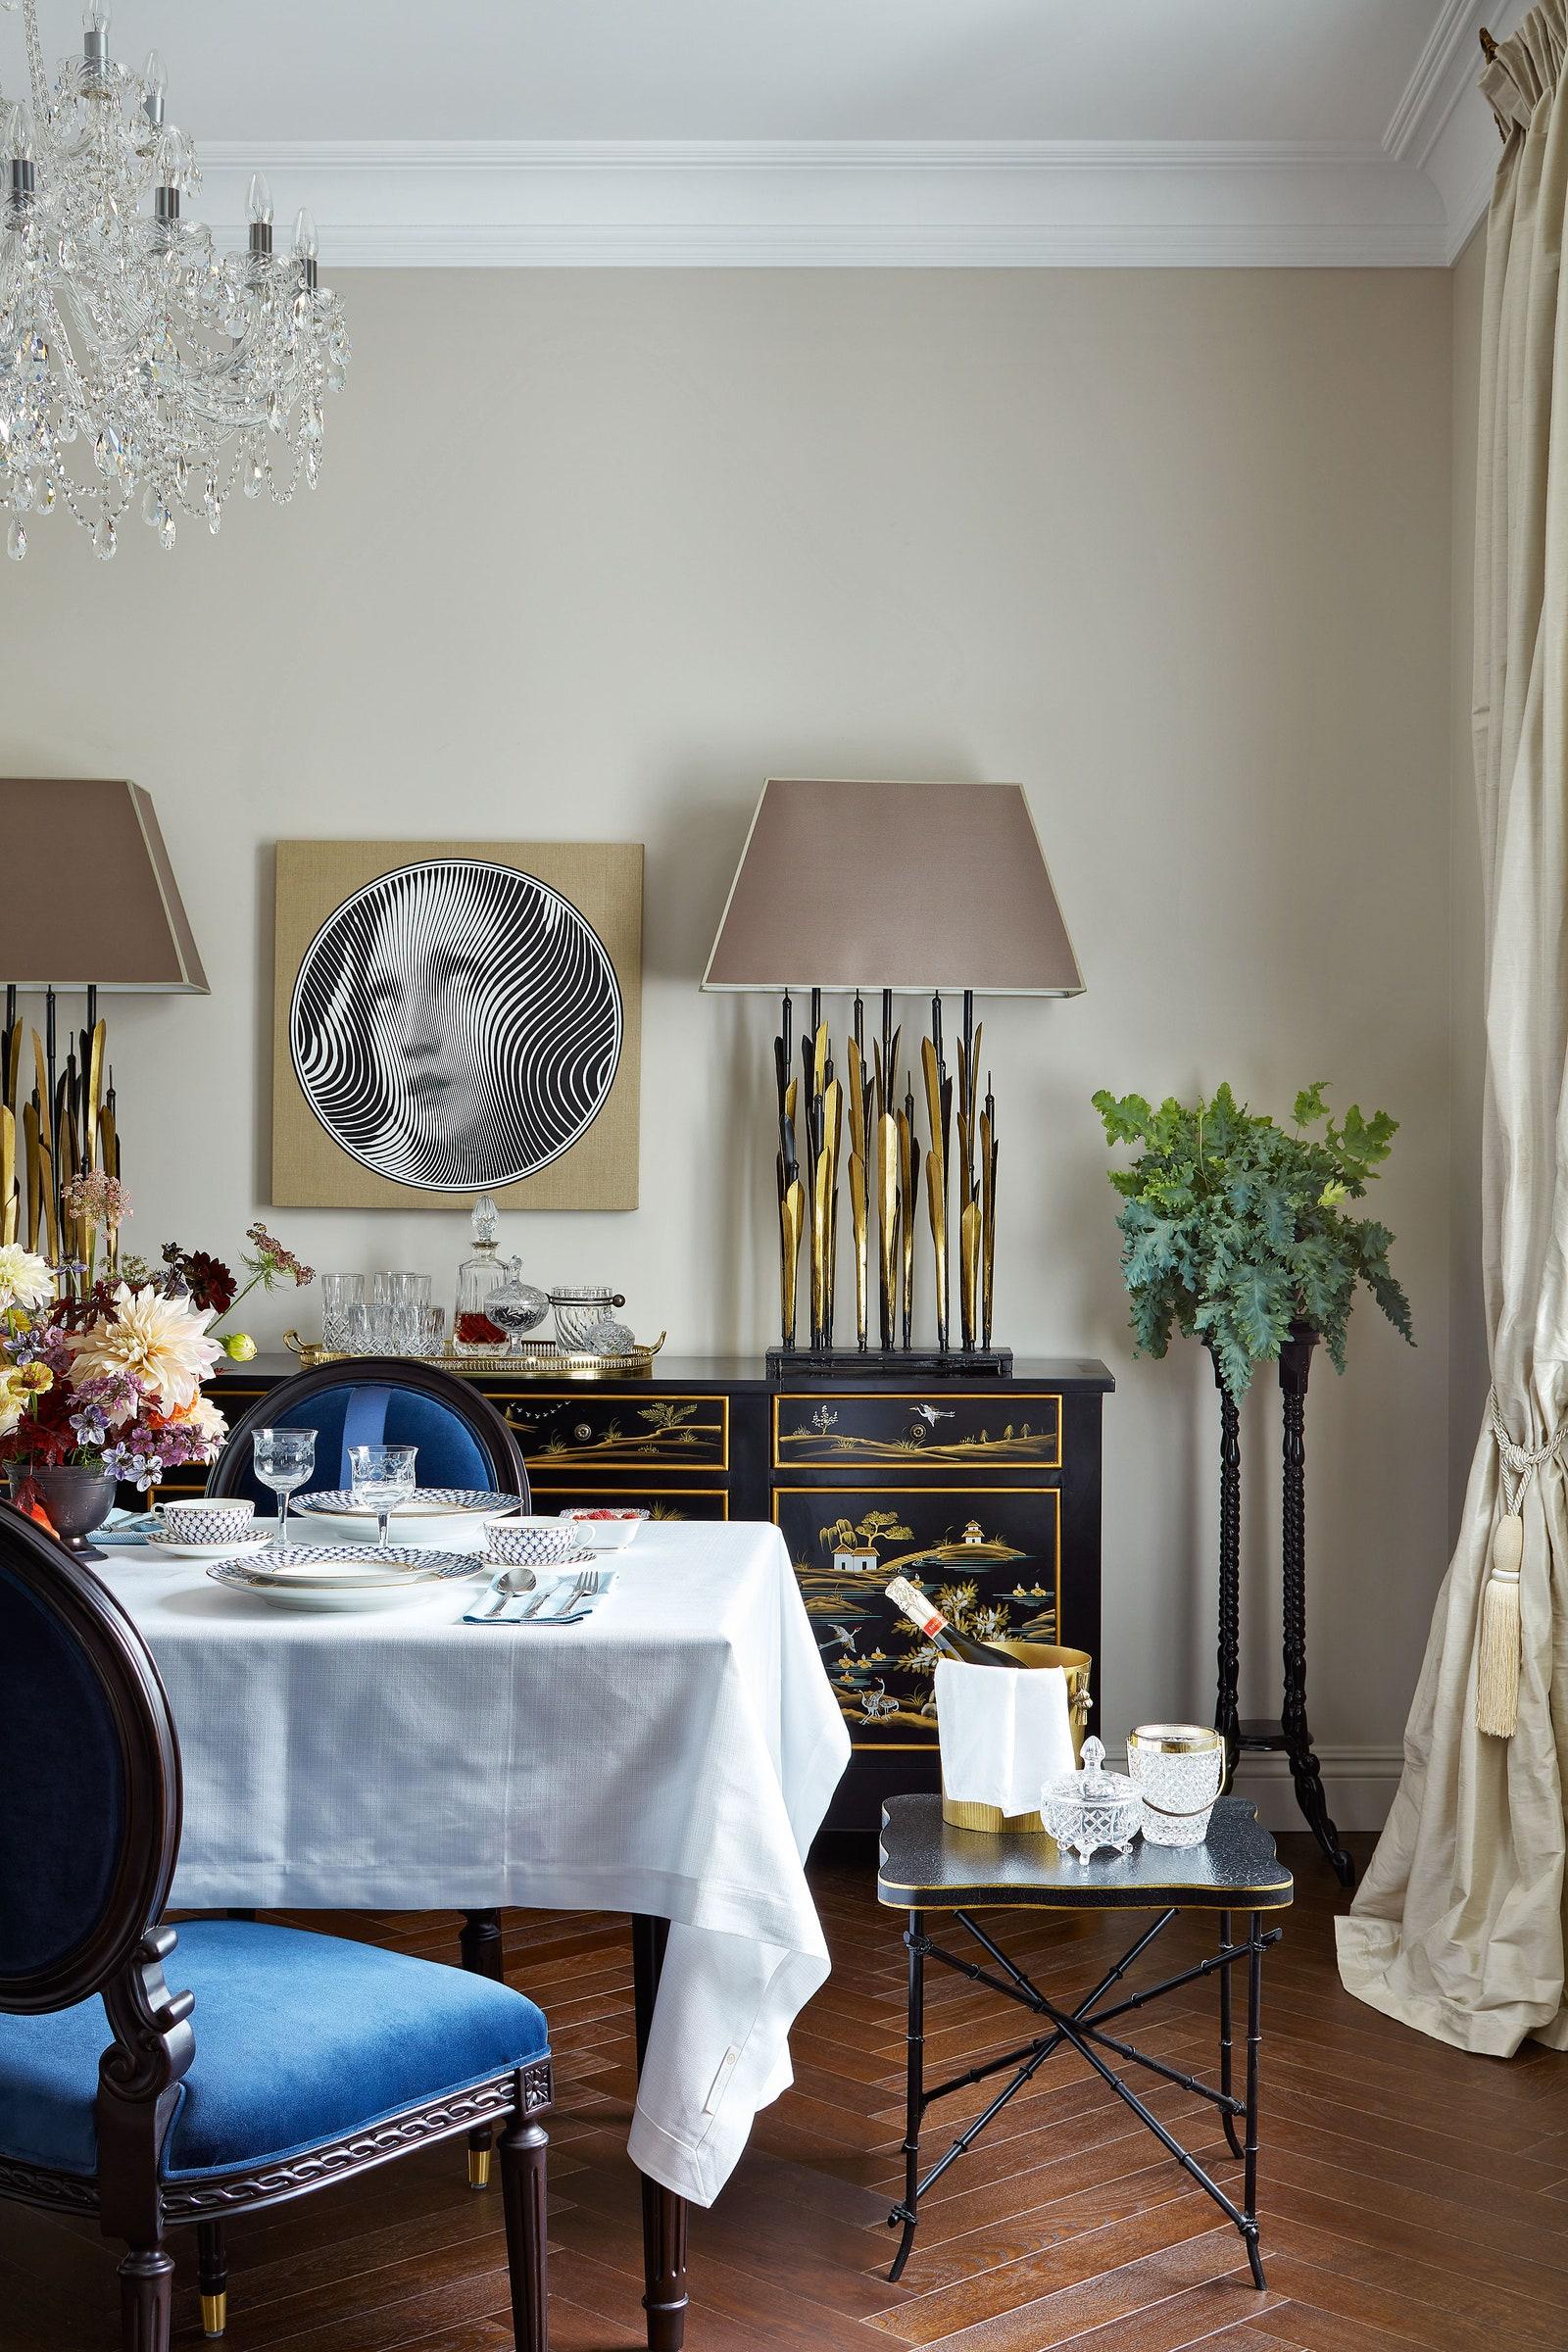 Bohemia Ivele Crystal     Mis en Demeure   Redecoration.     .